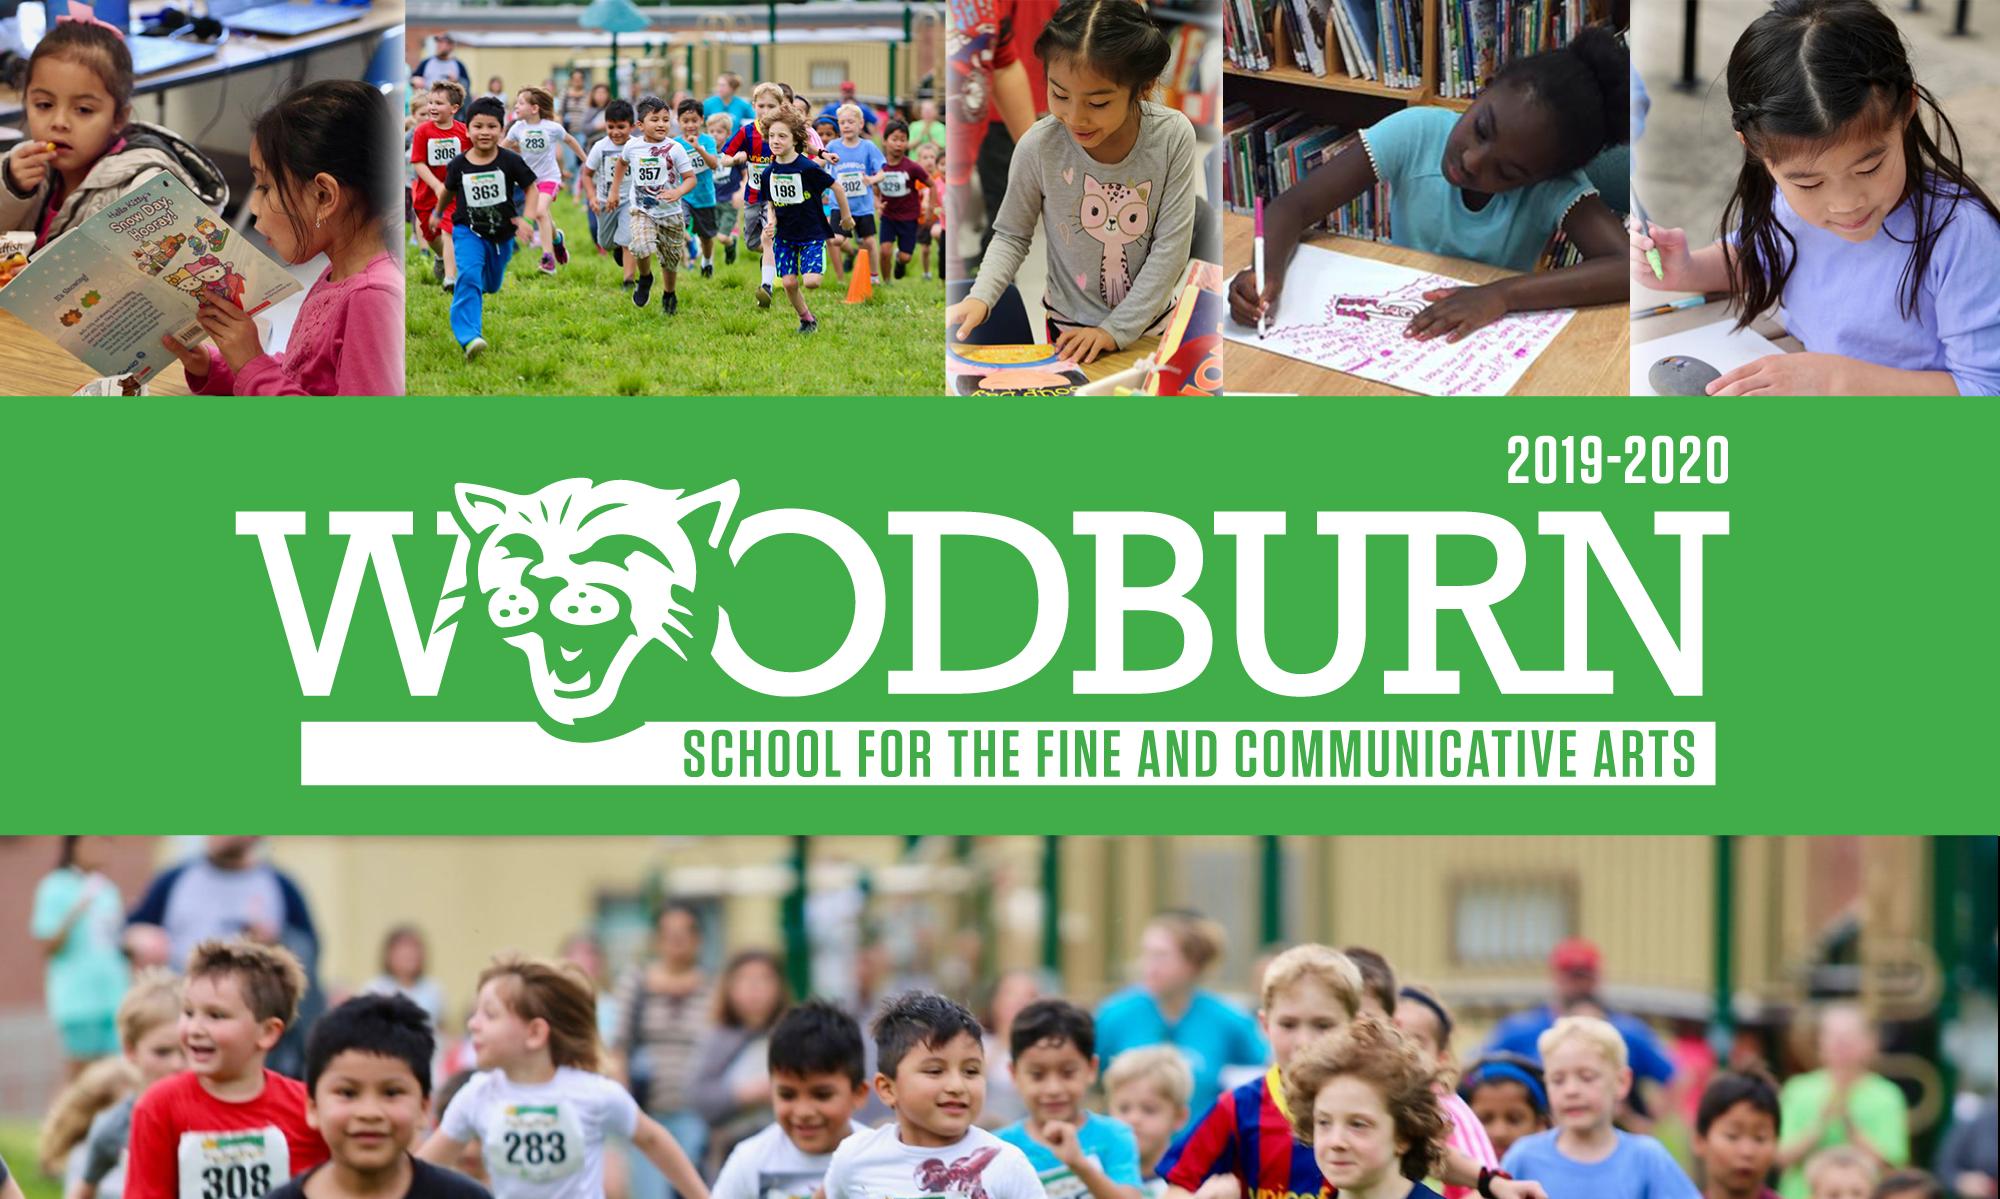 Woodburn Elementary PTA